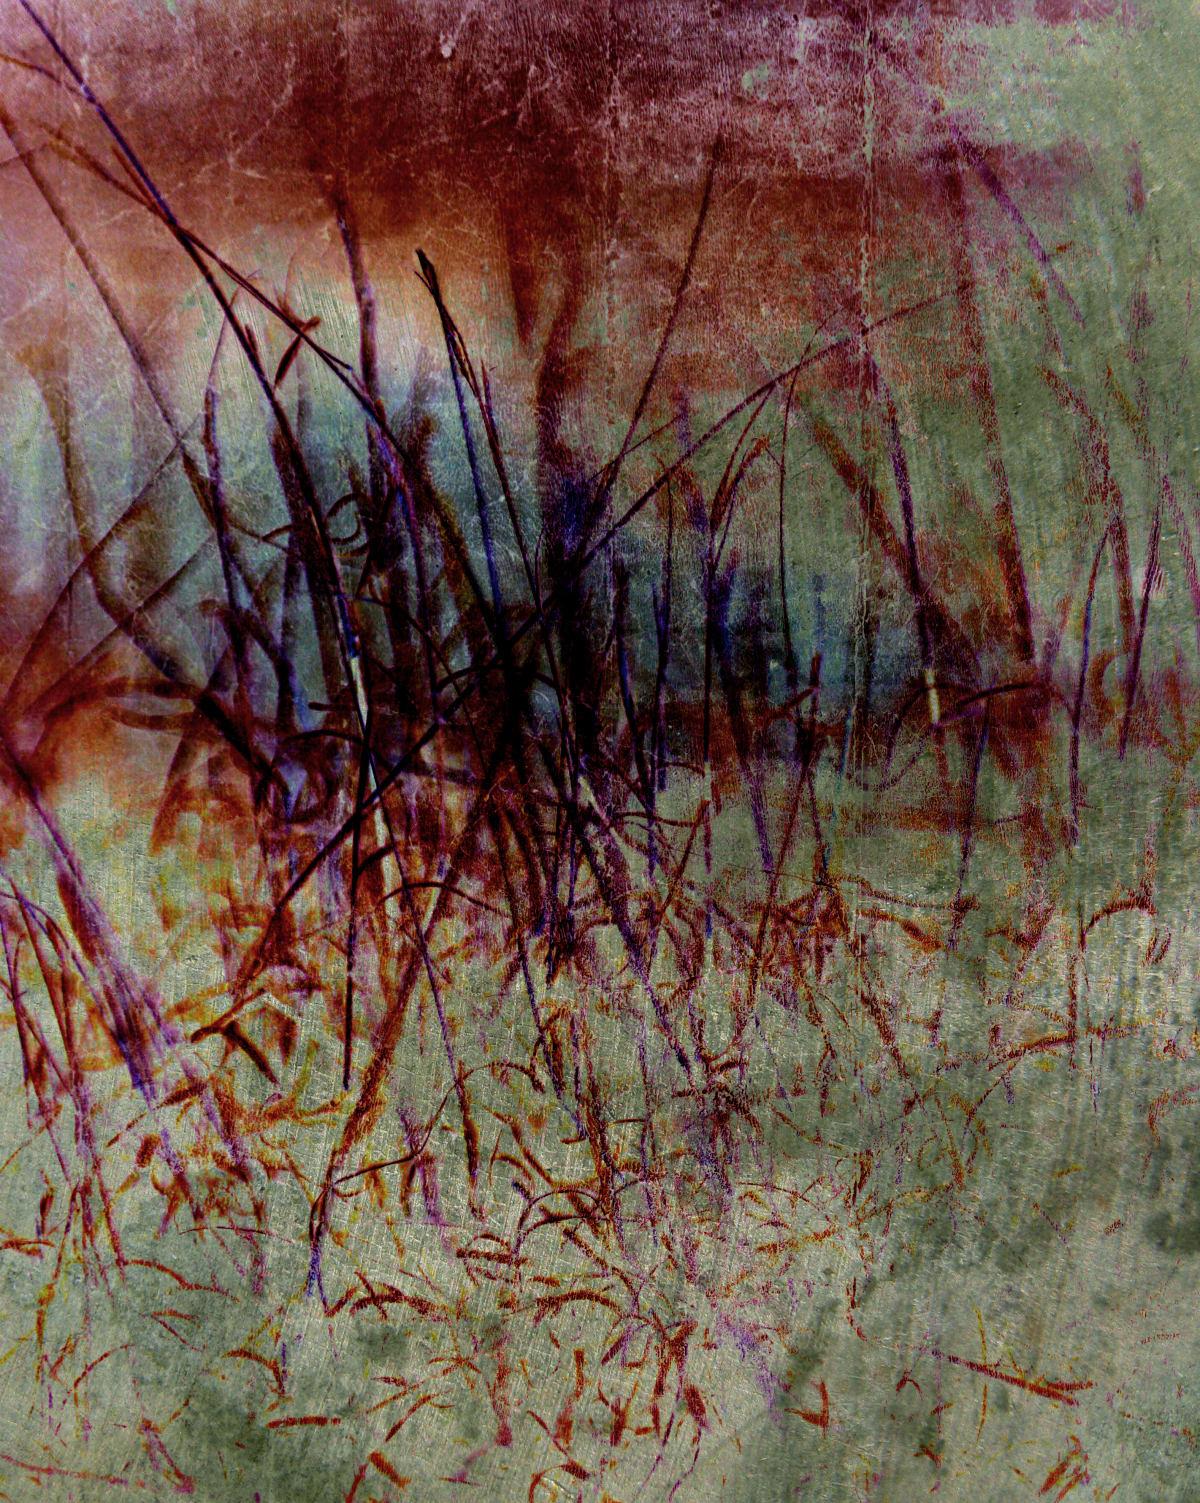 The Persistence of Desert Grass